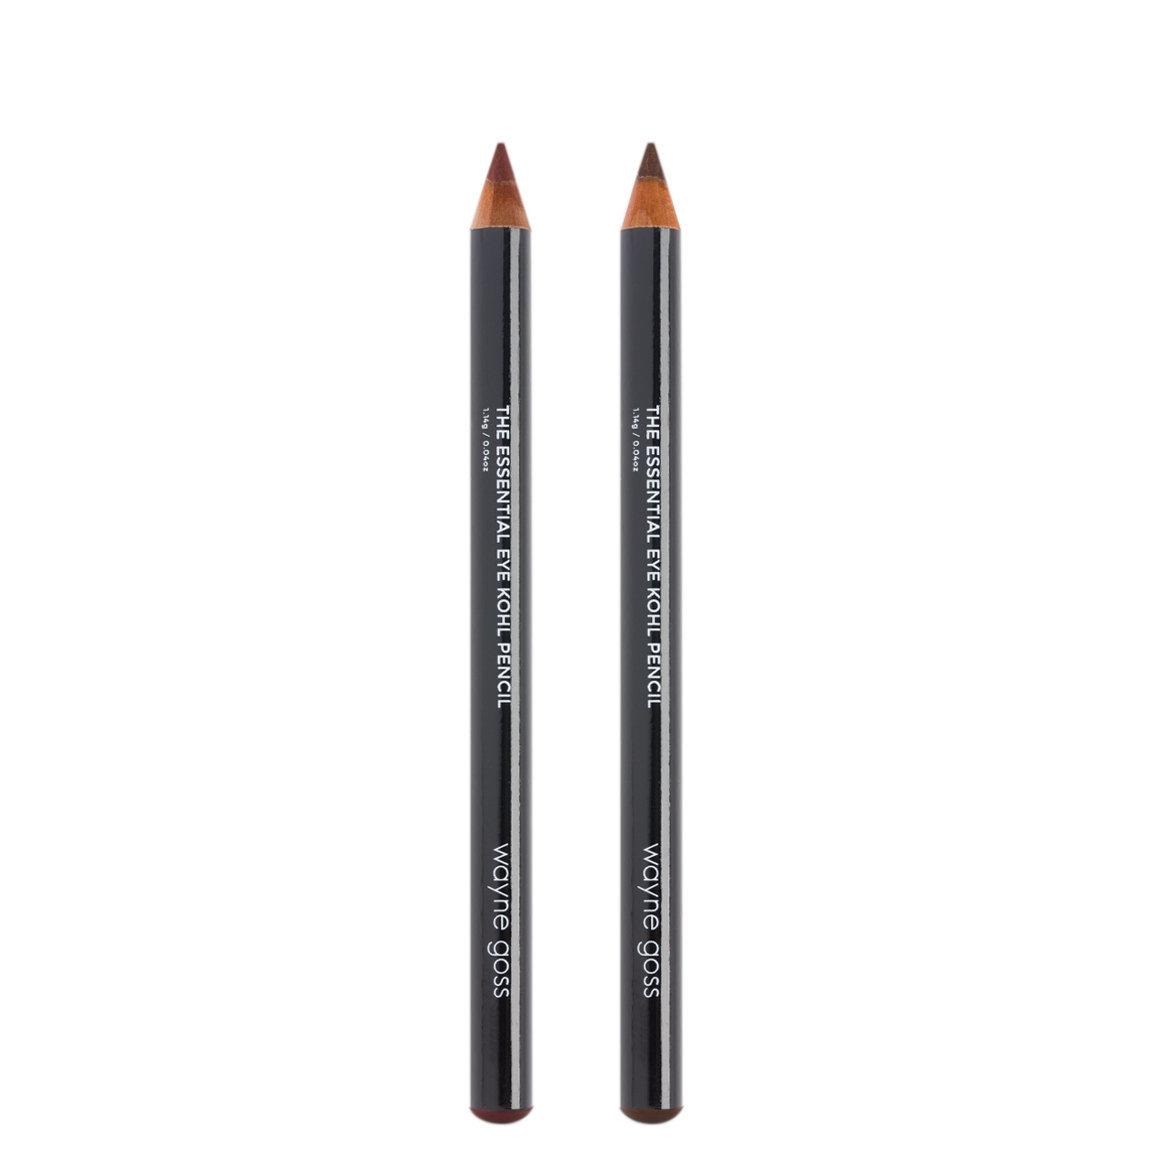 Wayne Goss The Tourmaline Essential Eye Kohl Pencil Set alternative view 1 - product swatch.